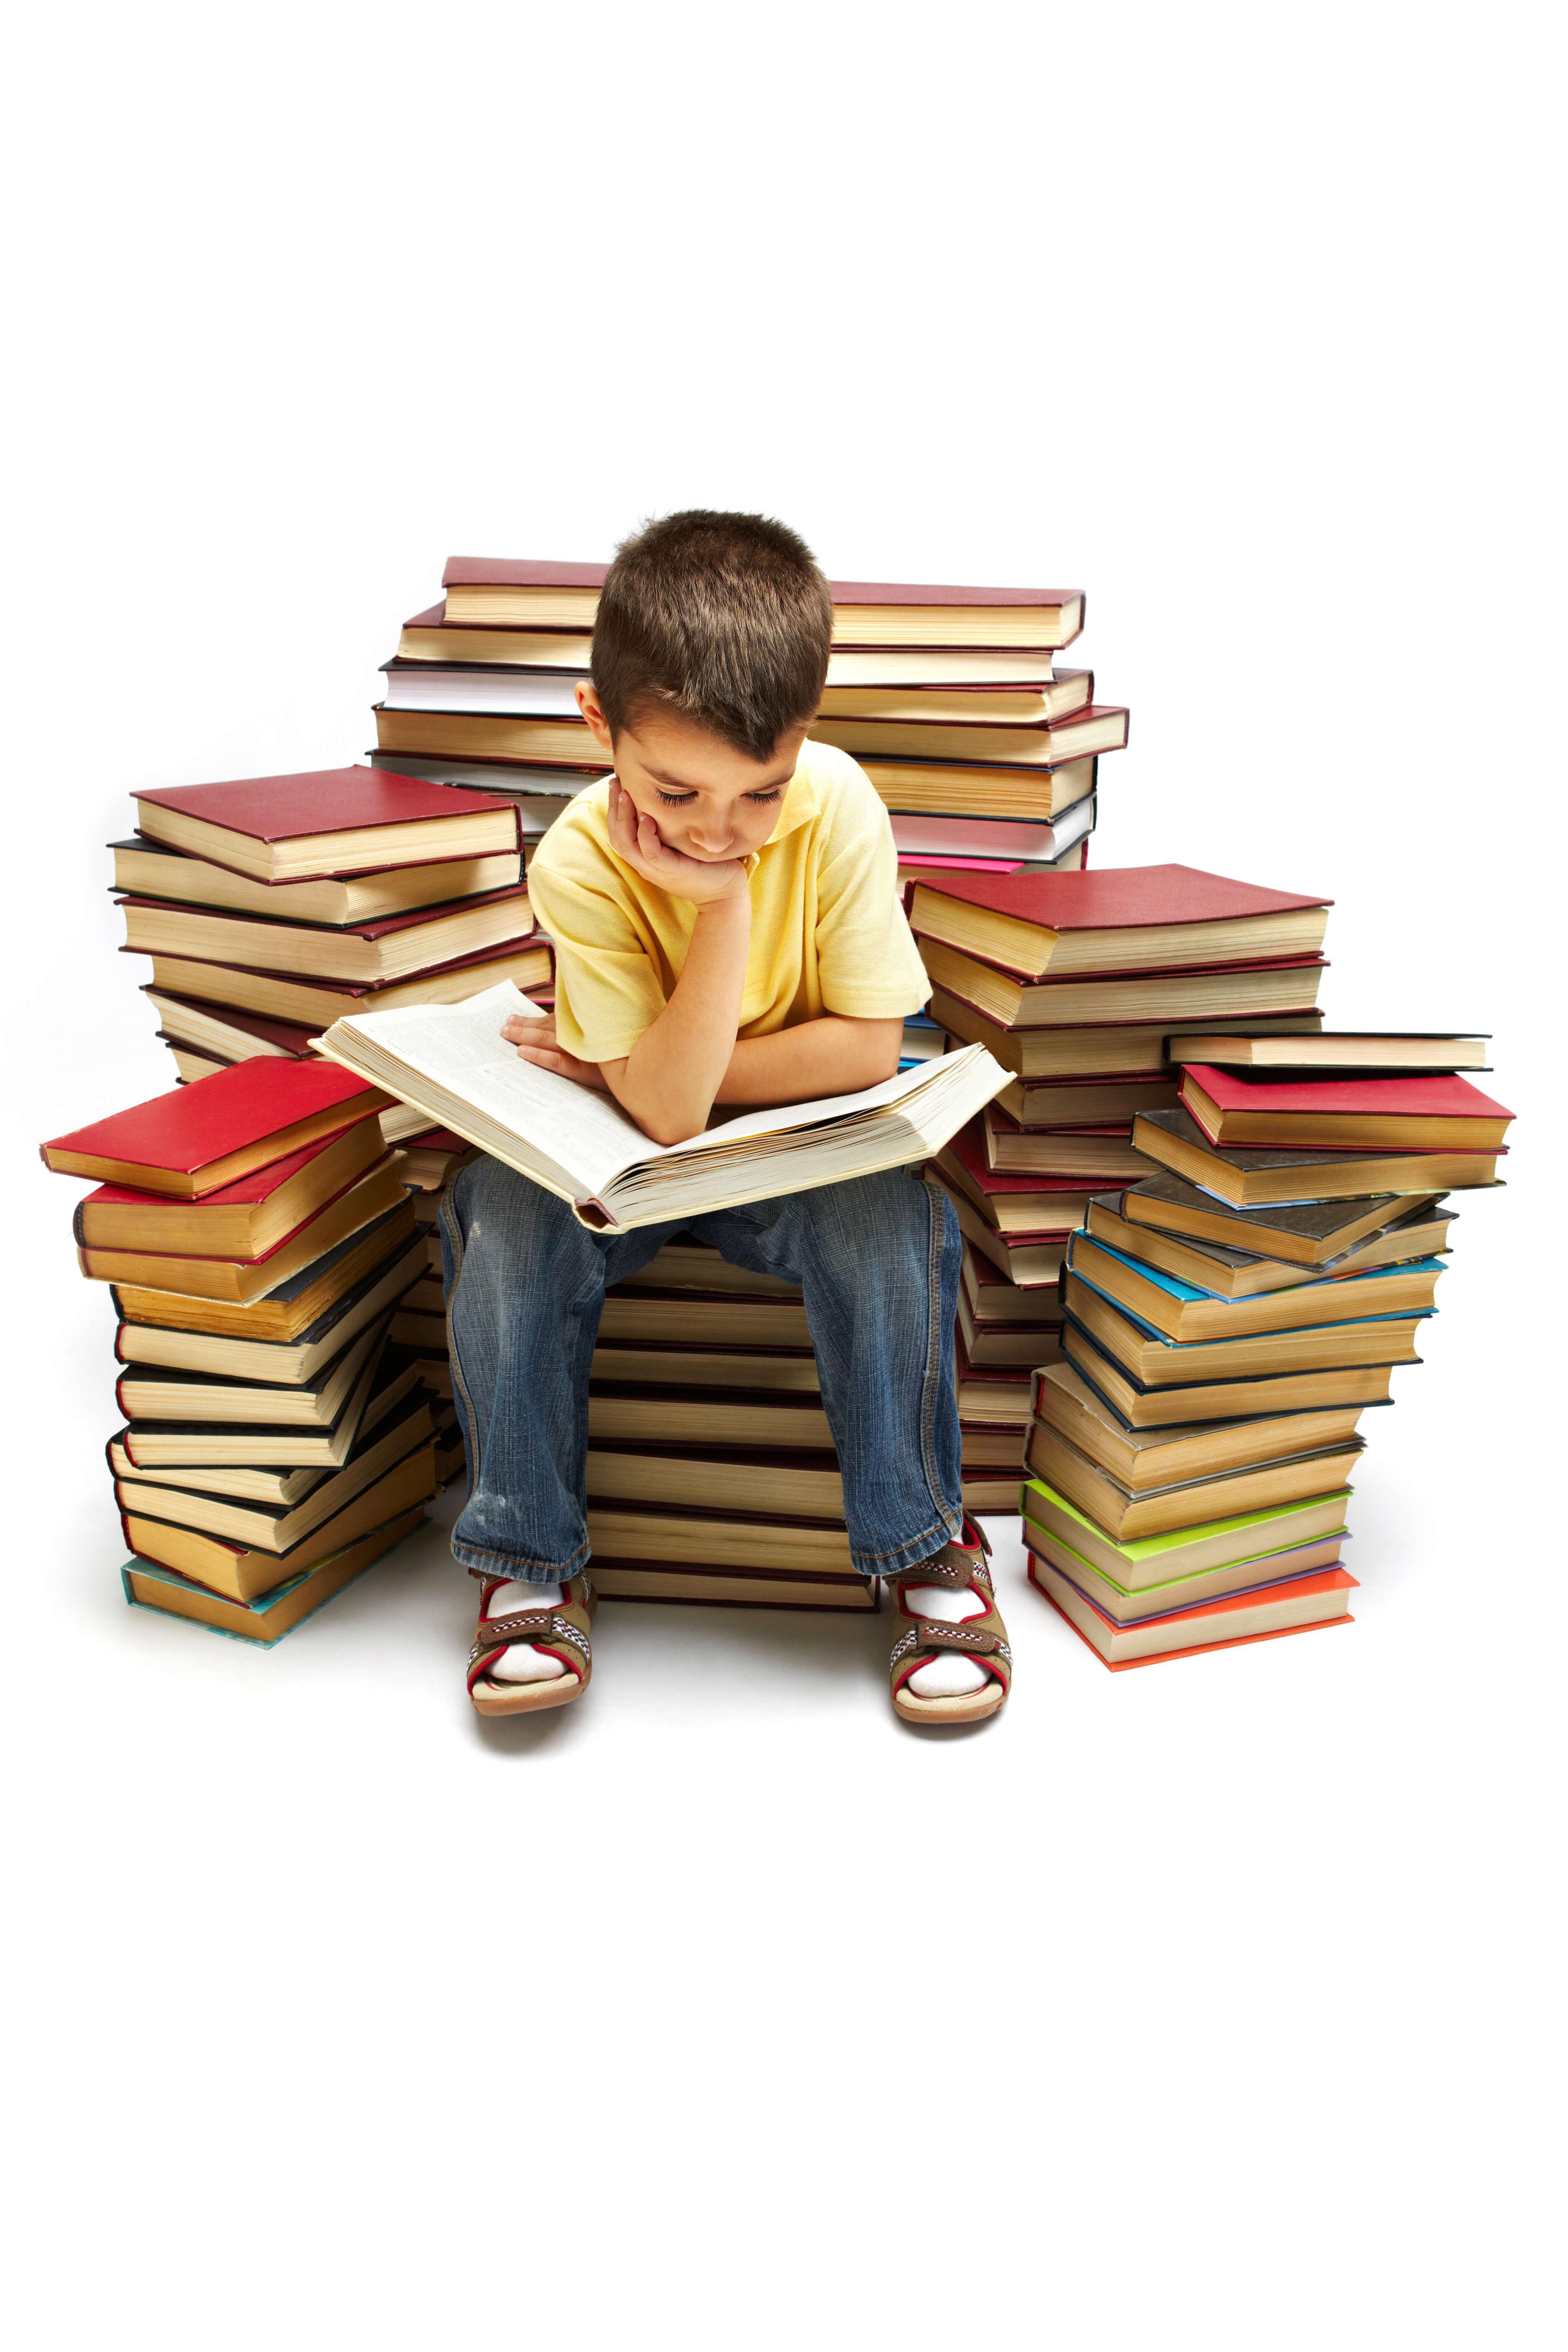 10 Ways To Help Struggling Readers